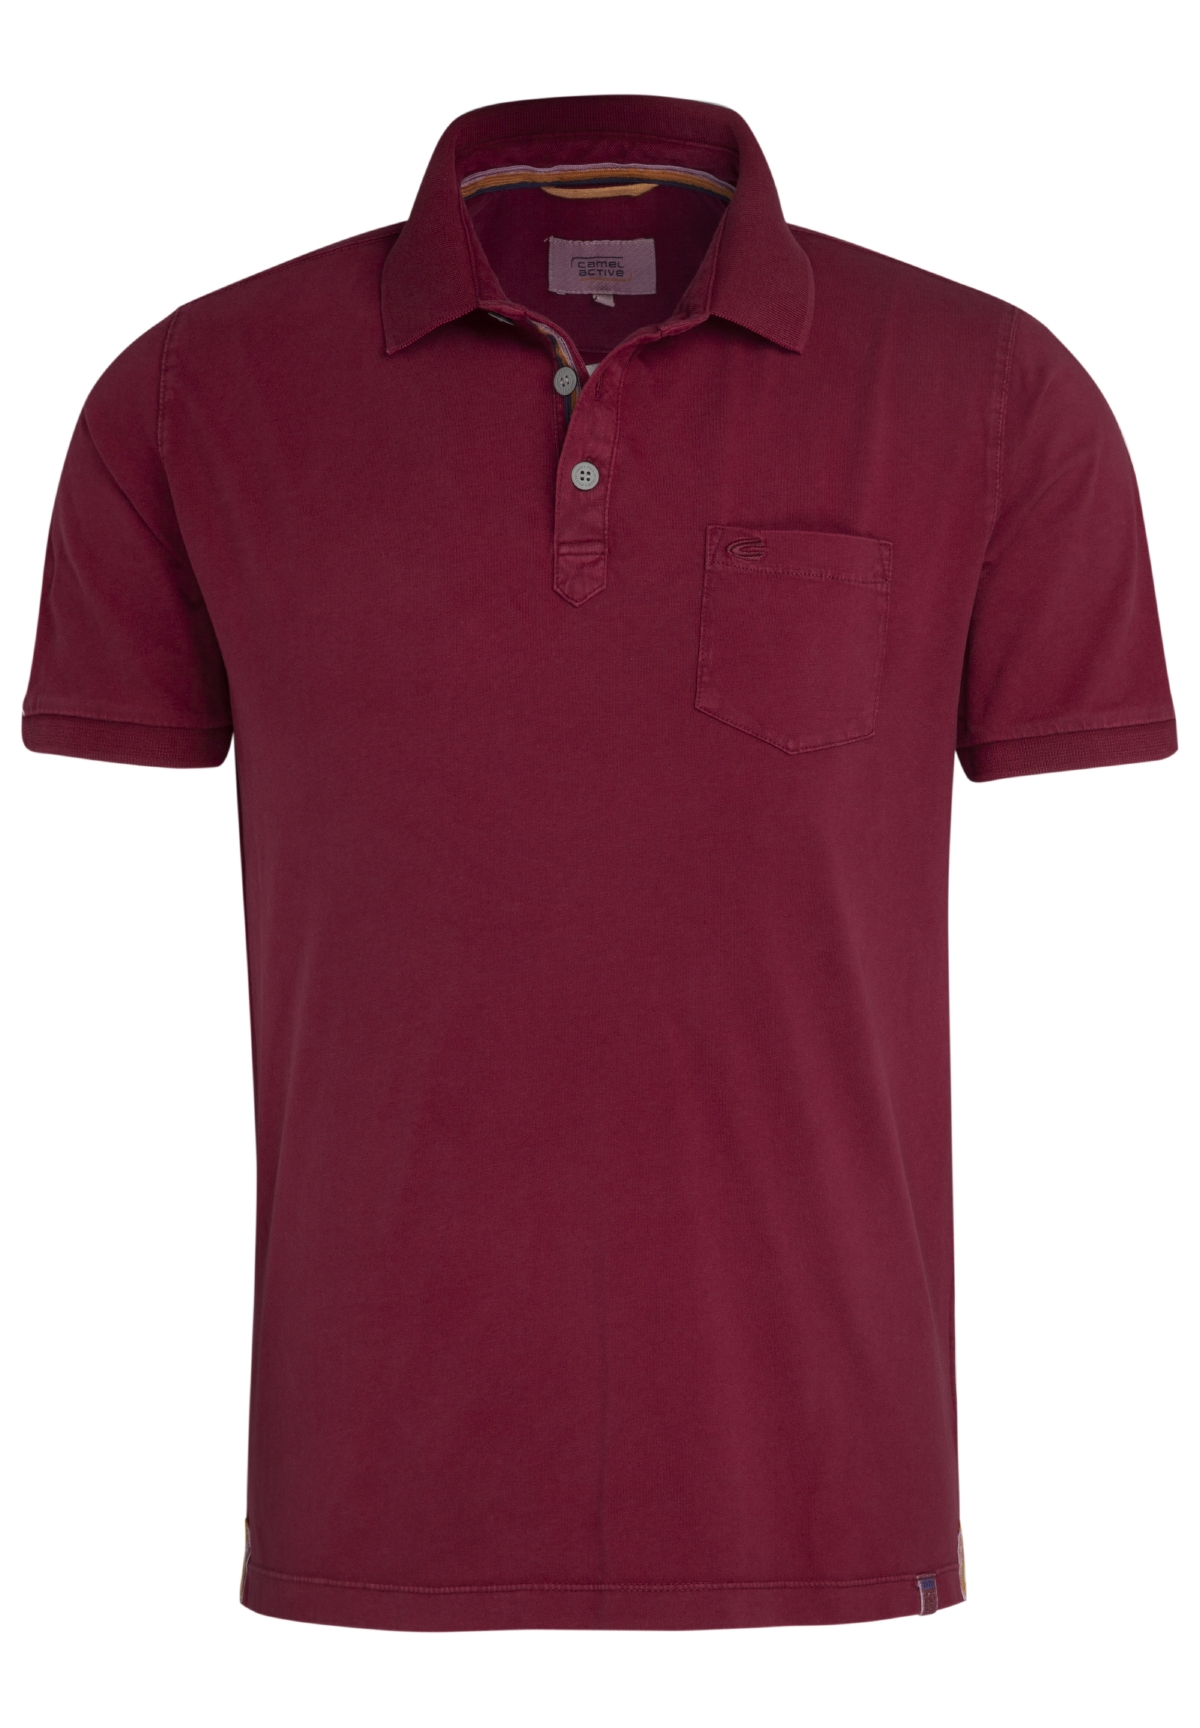 Camel-Active-Herren-Shirt-Poloshirt-Pique-Regular-Fit-NEU Indexbild 57